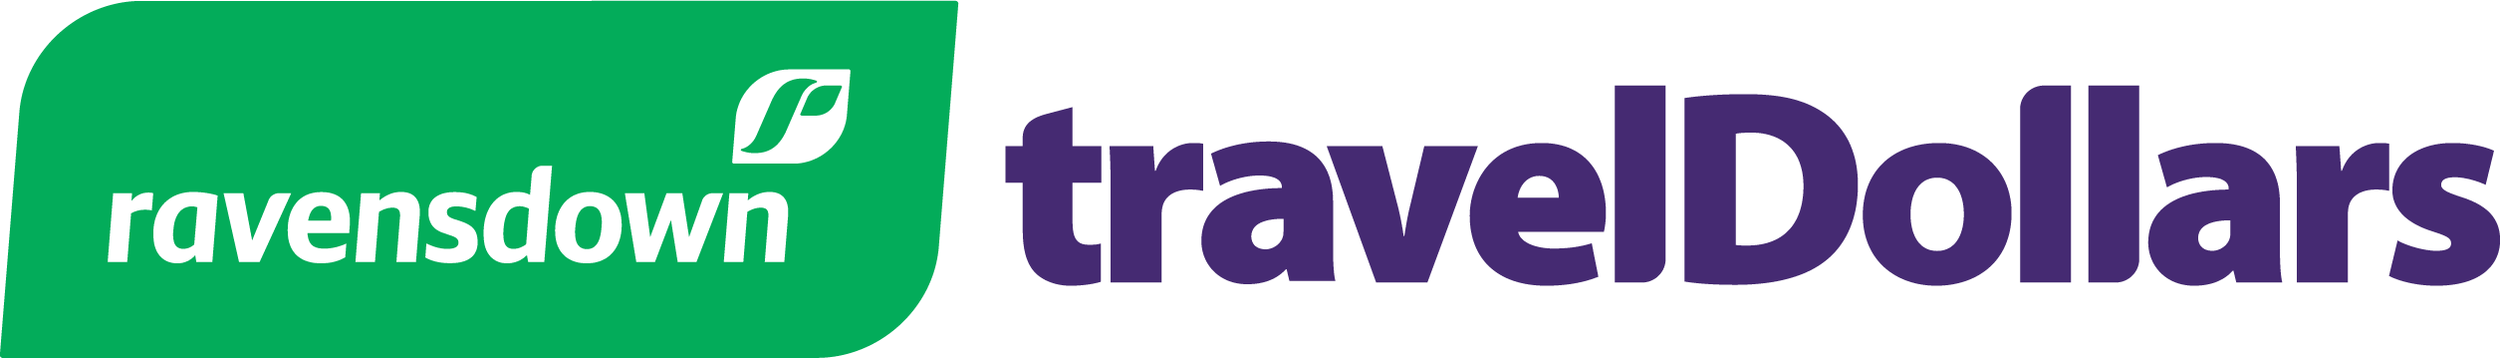 ravensdown-logo-Asset 1@2x.png